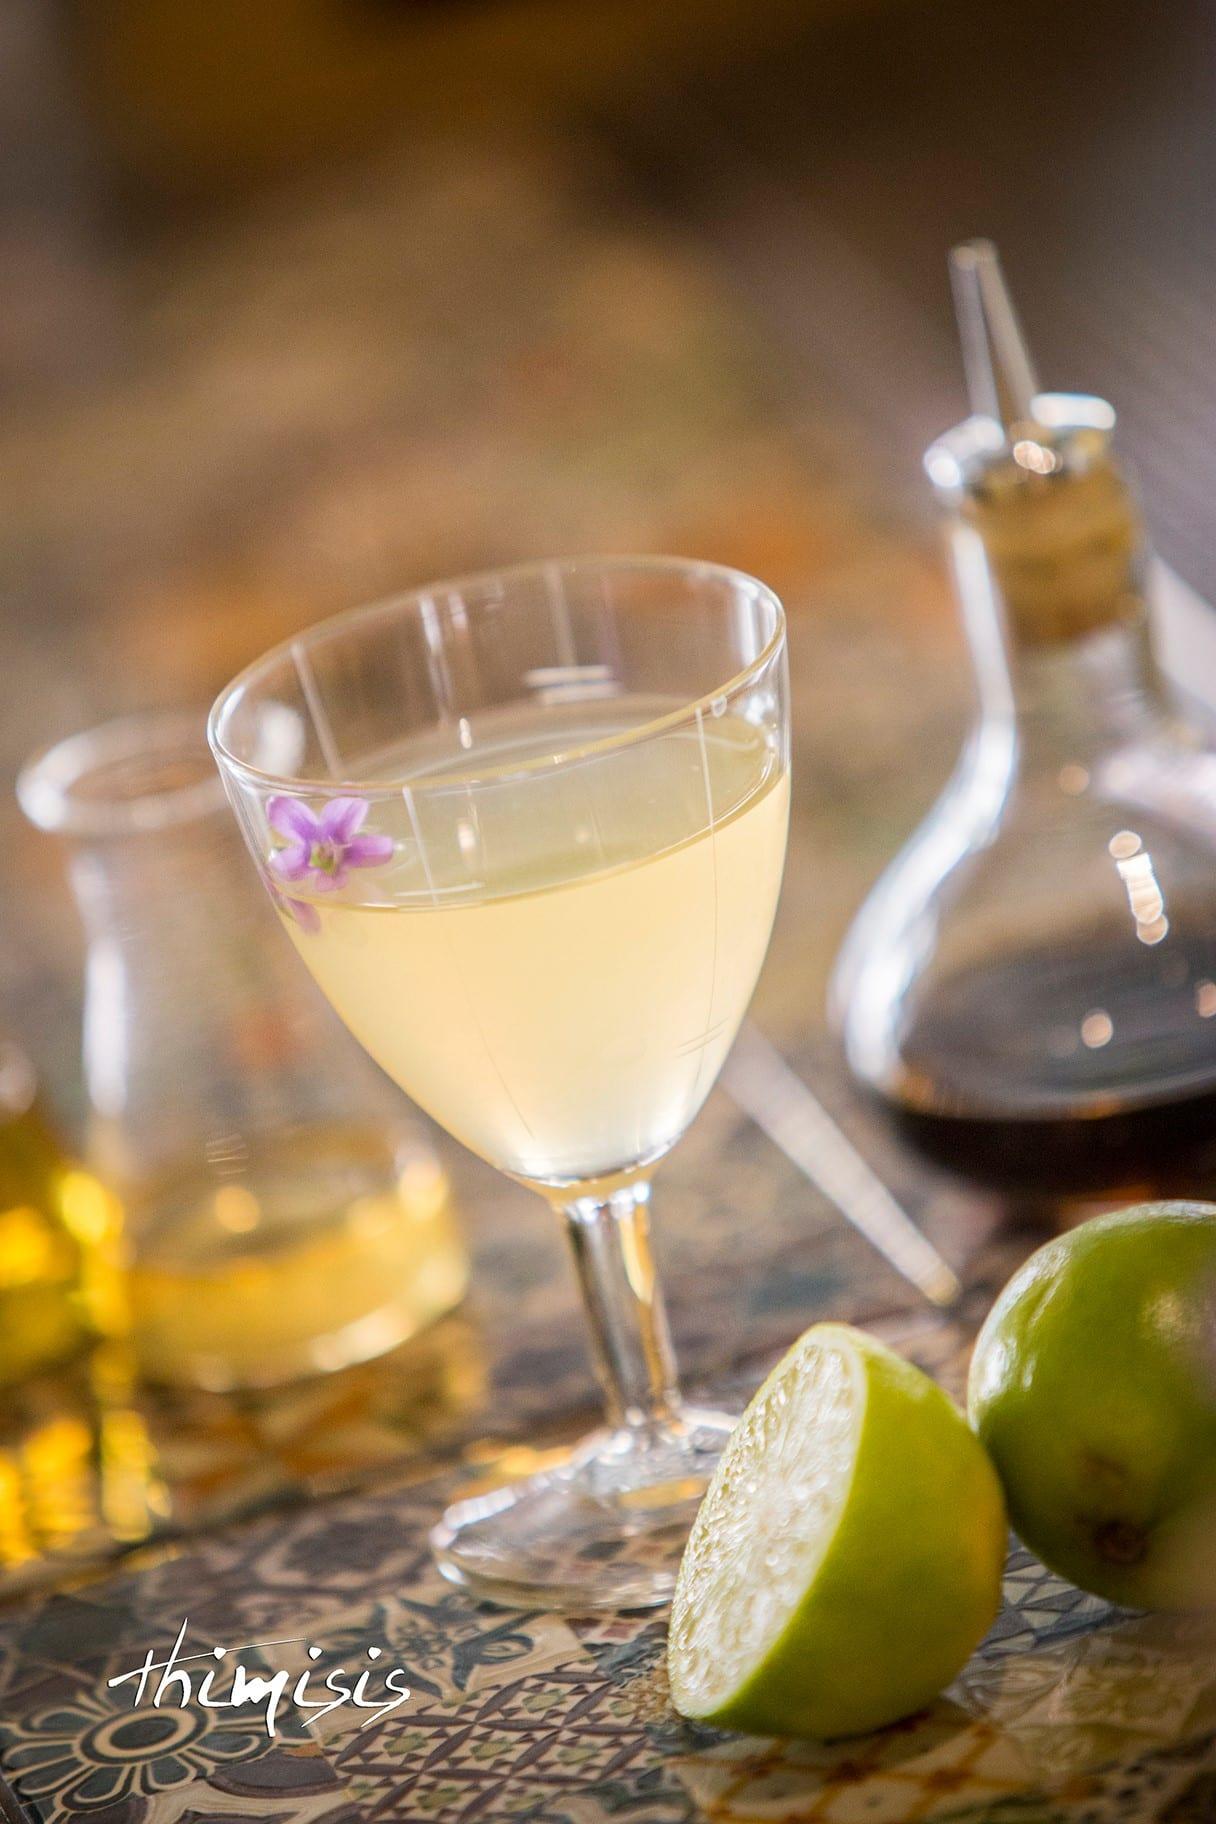 Thimisis: Ένα Cocktail γεμάτο αναμνήσεις!